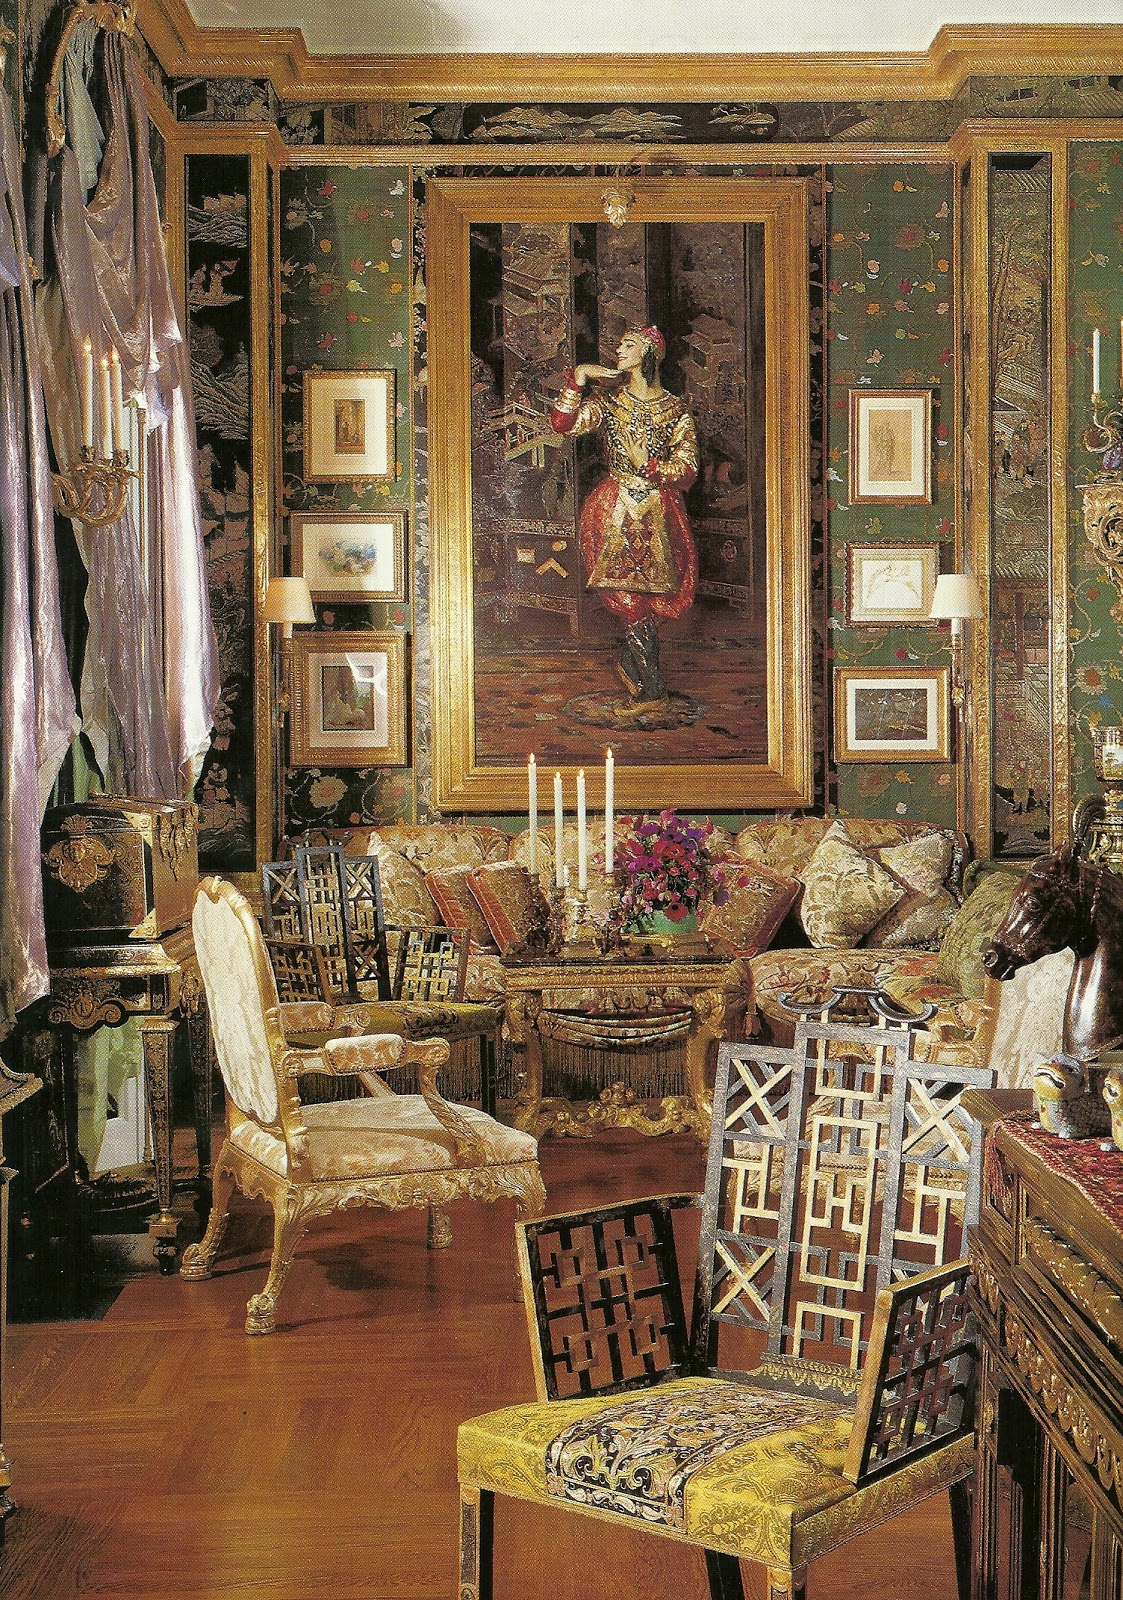 Leighton Dining Room Set Little Augury Ann Getty Degas The Divine Sarah Amp A Tree